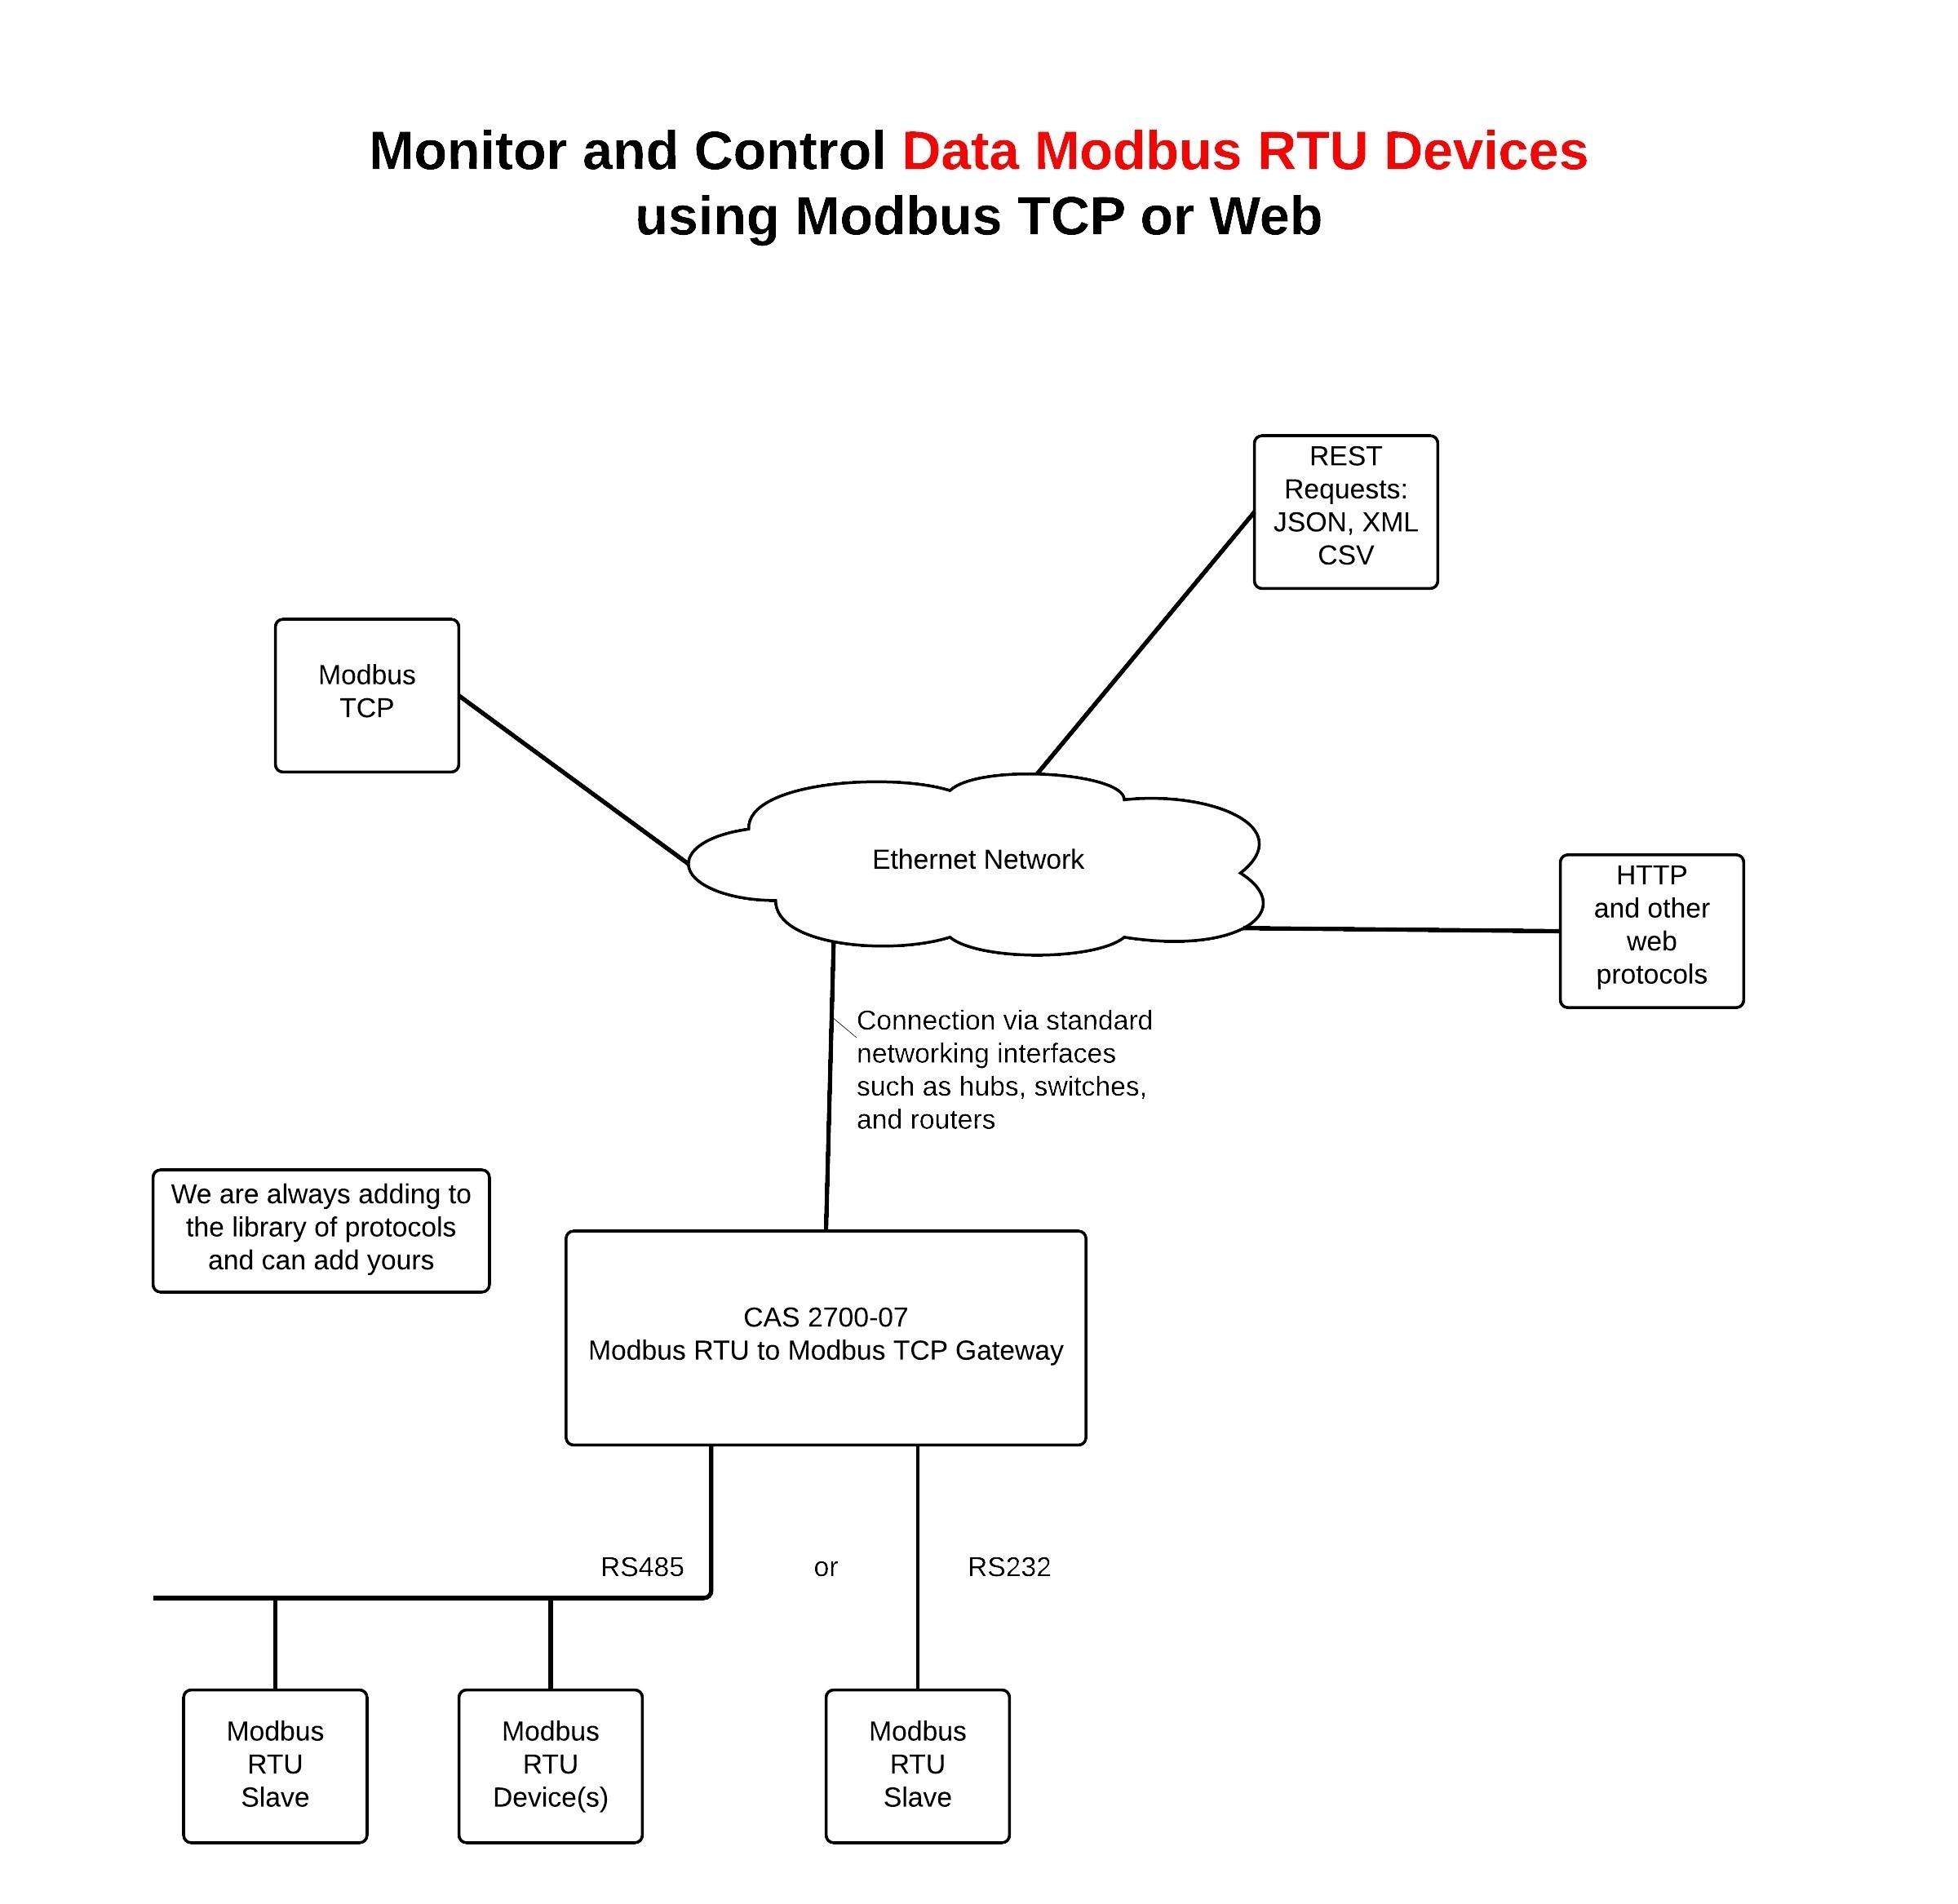 Diagram Of Car Controls Wiring Diagram Ac Split Lg Save tower Ac Wiring Diagram Fresh Http Of Diagram Of Car Controls